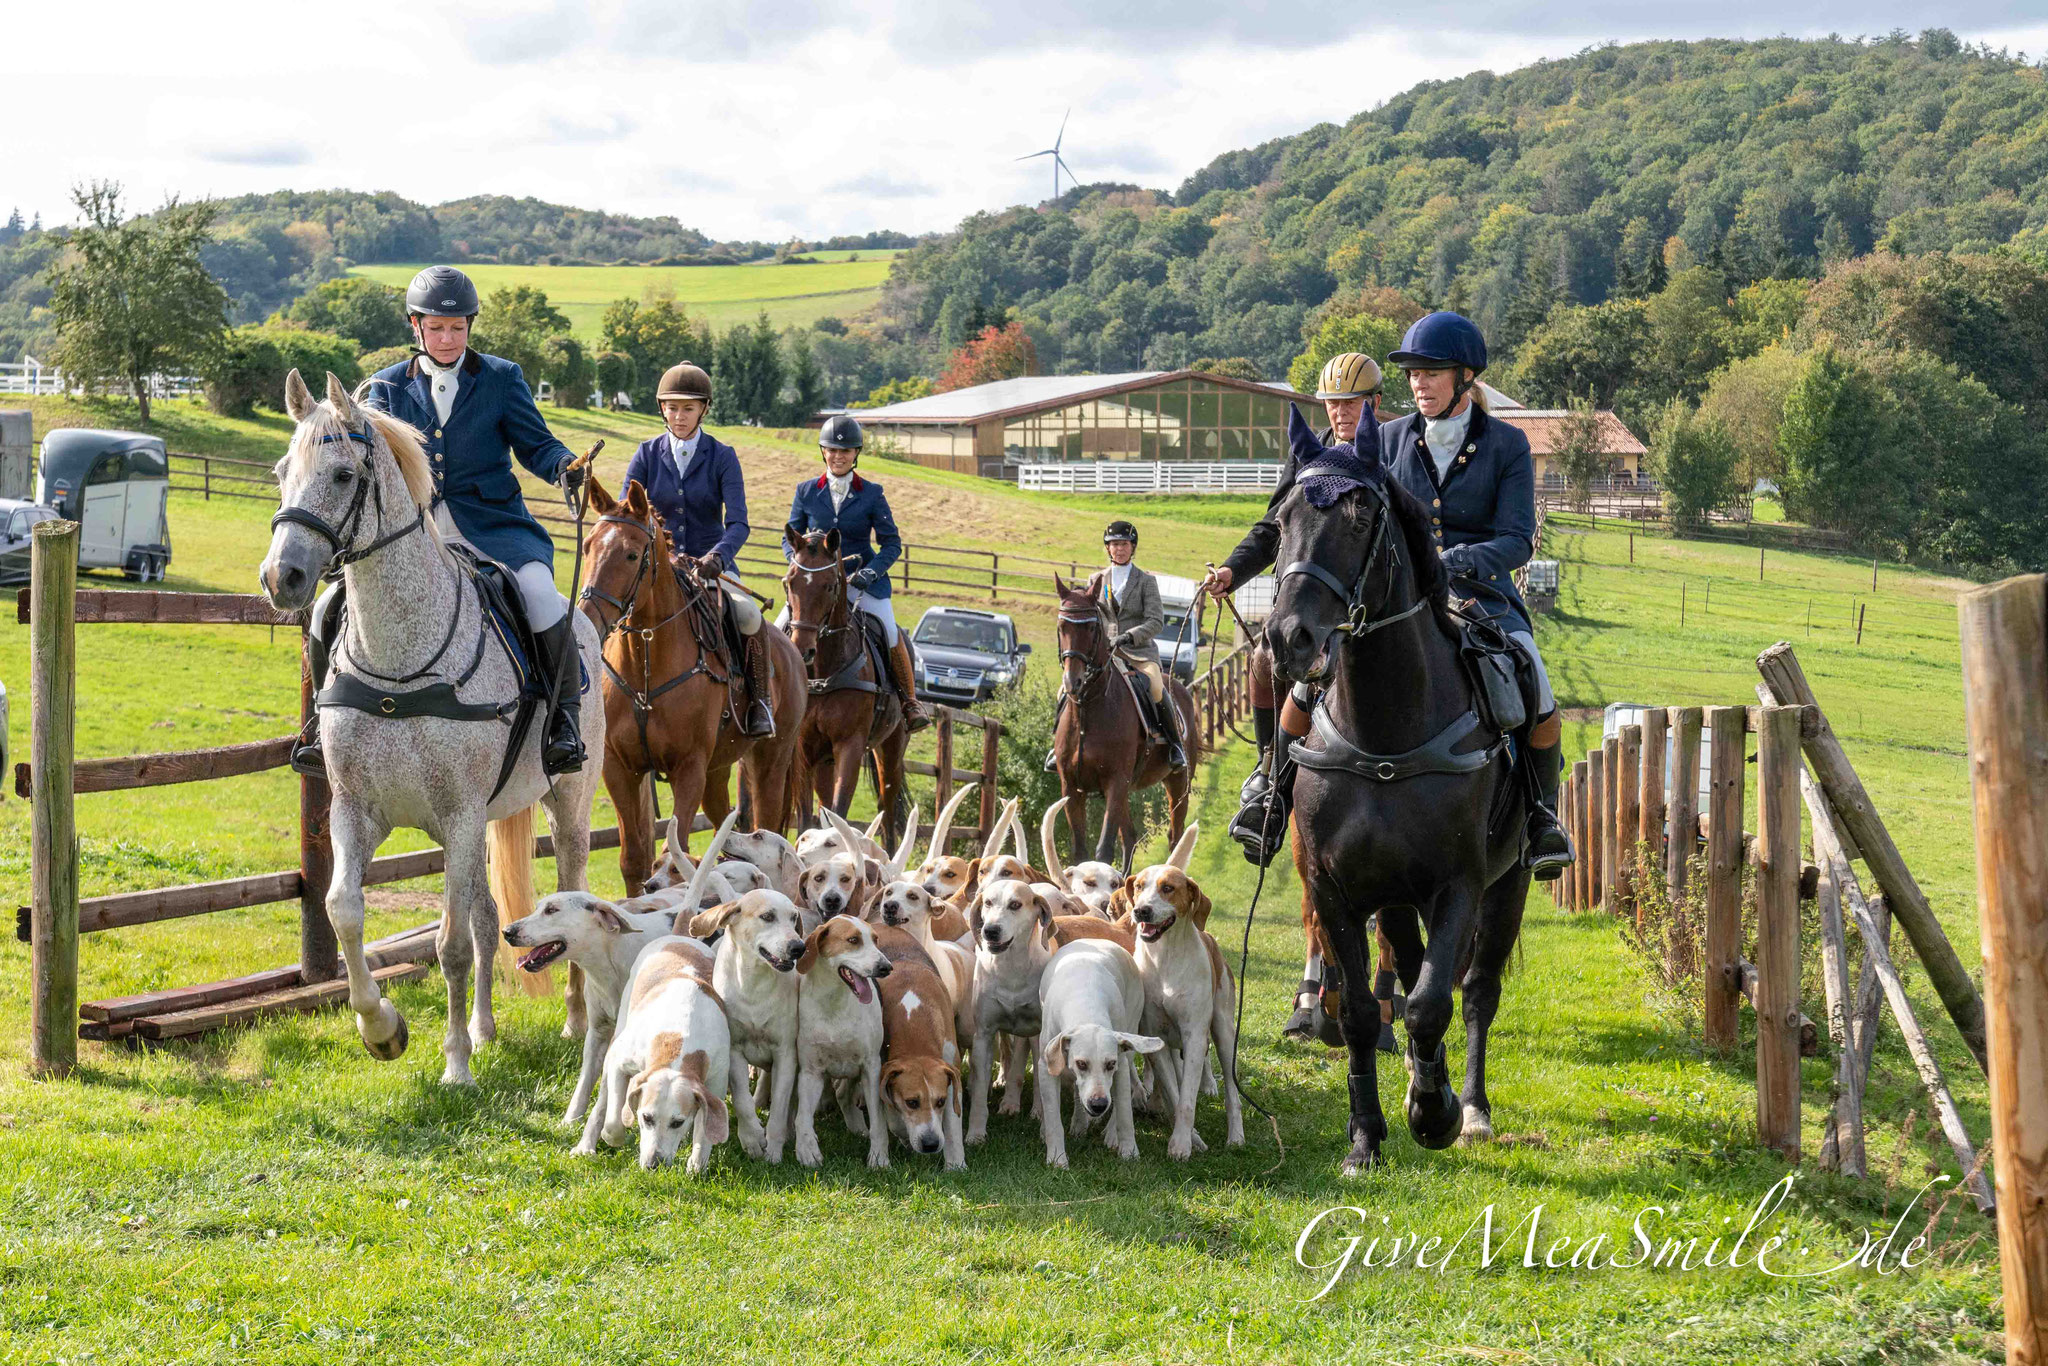 Jagdfotos vom Team @Givemeasmile.de auf der Fotojagd, Peter Jäger  #hofhirtenberg #givemeasmilede #taunusmeute #foxhounds #beagles #jagdreiten #schleppjagd